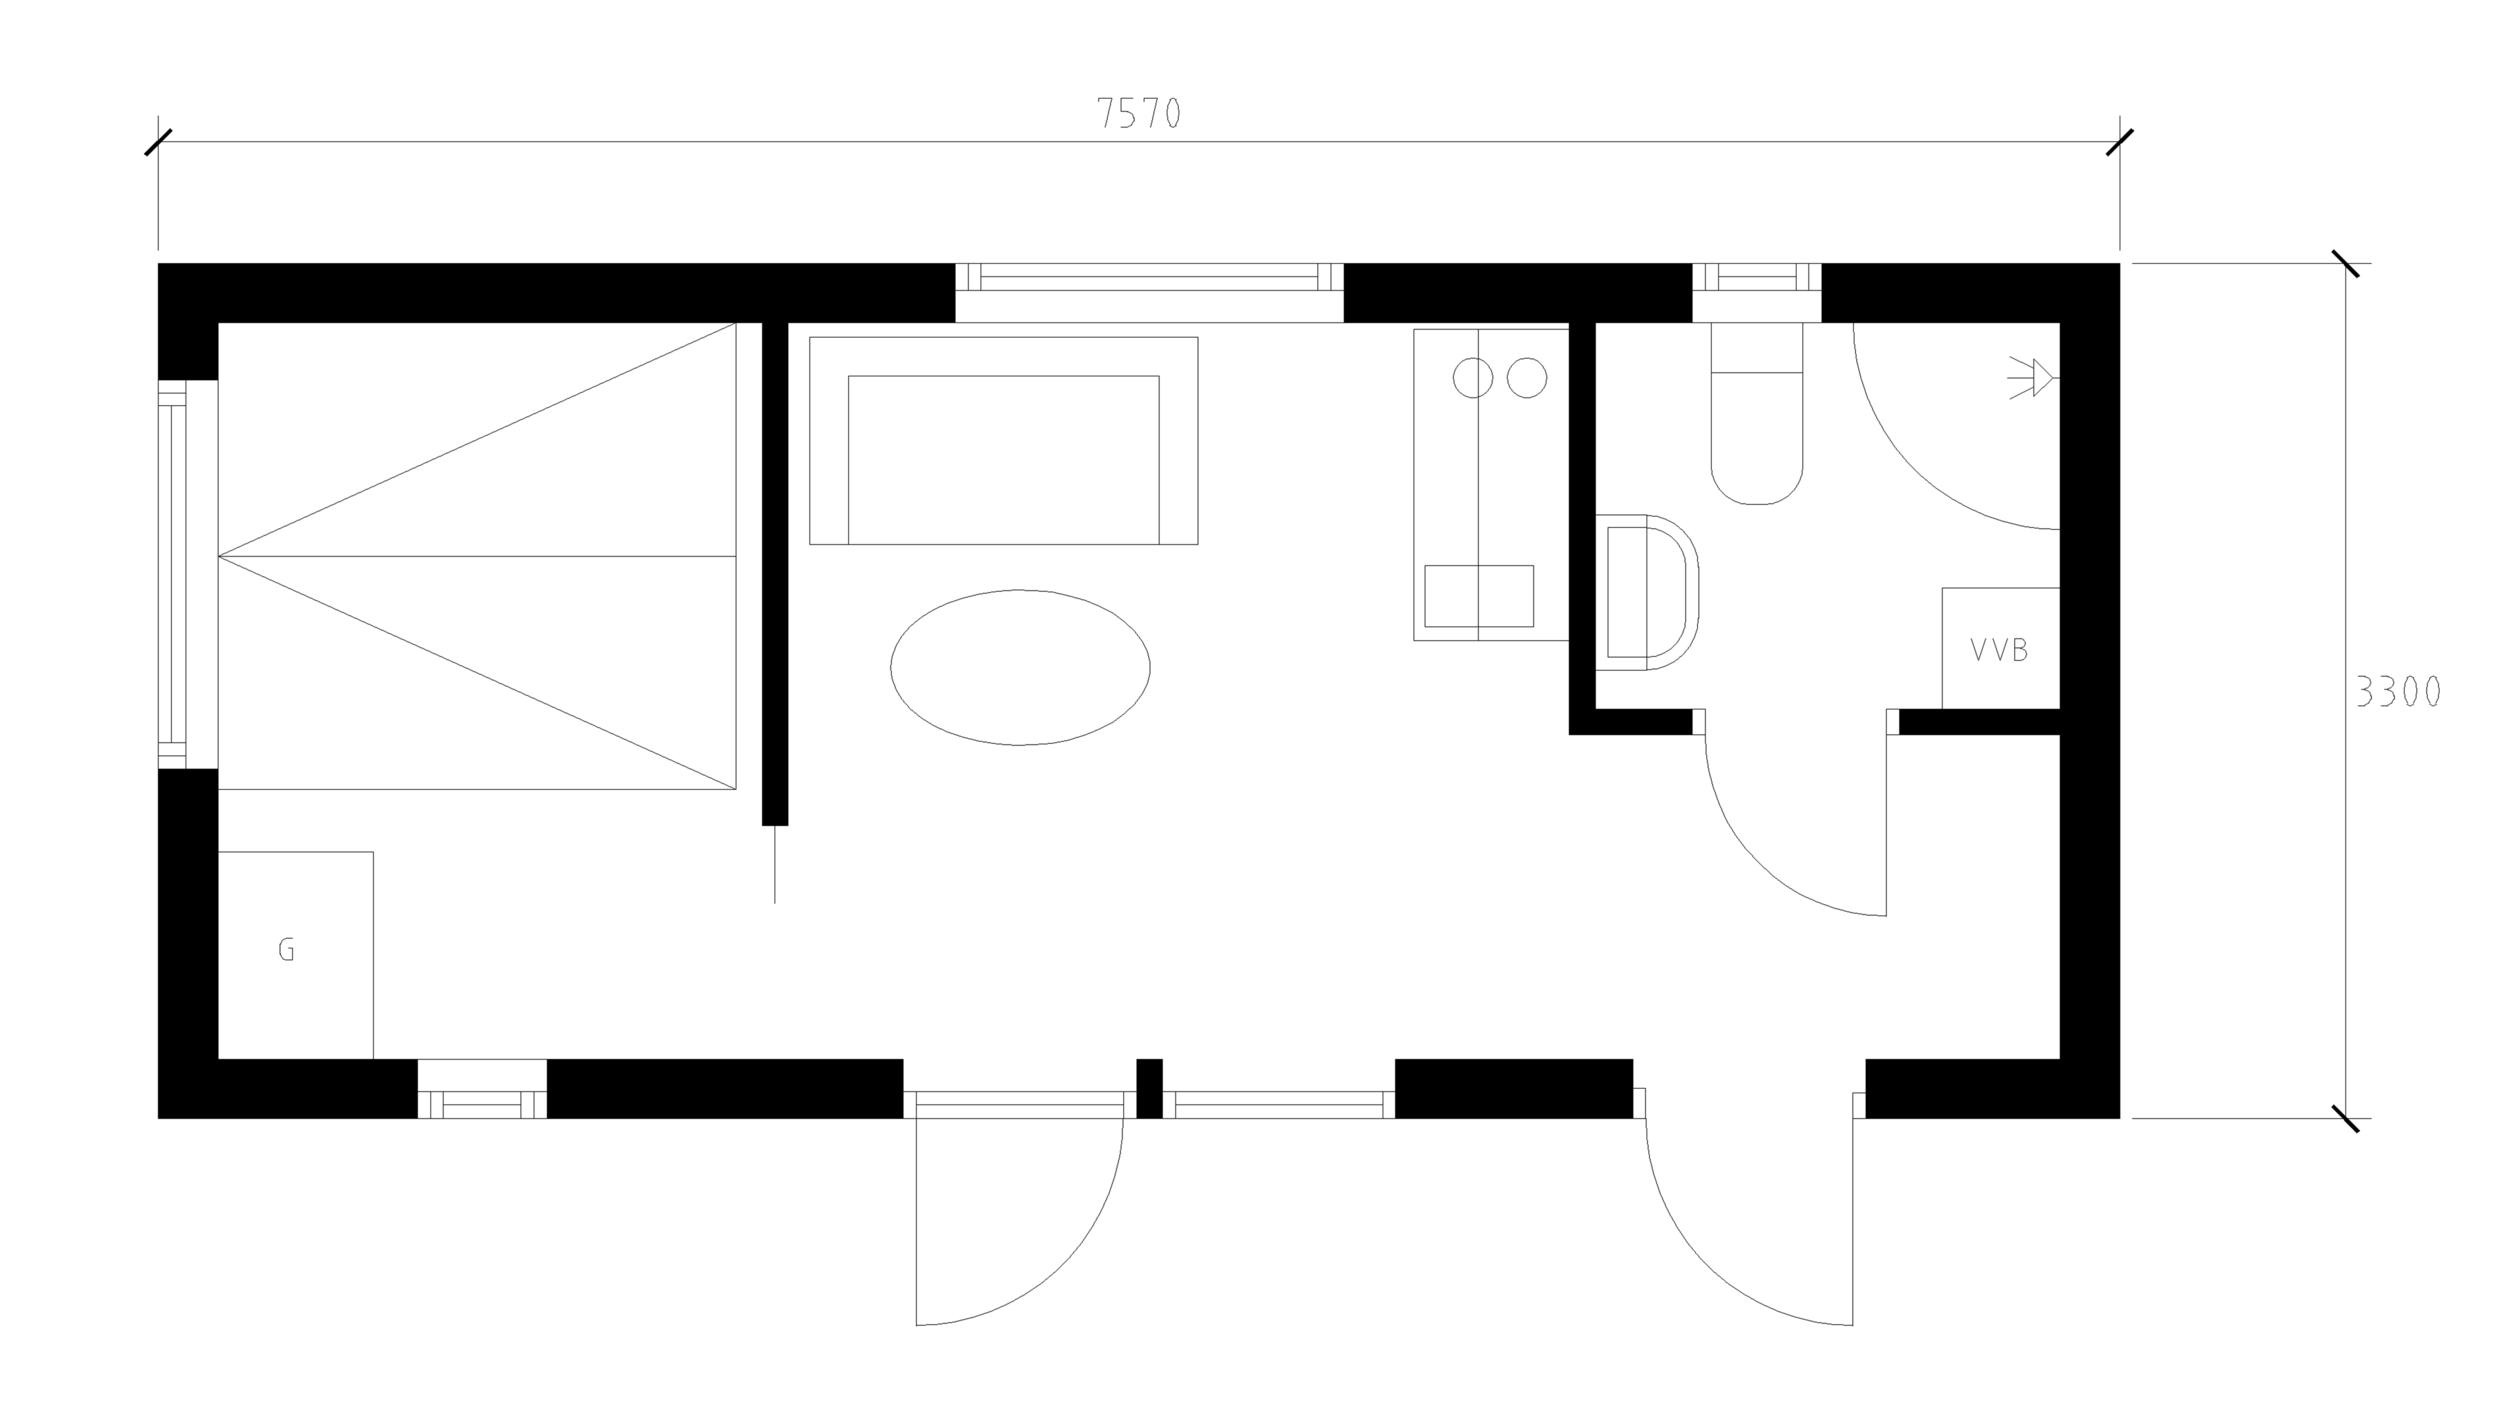 easy-house-attefallshus-åhus-25-med-sovrum-badrum-kök-planlösning-1